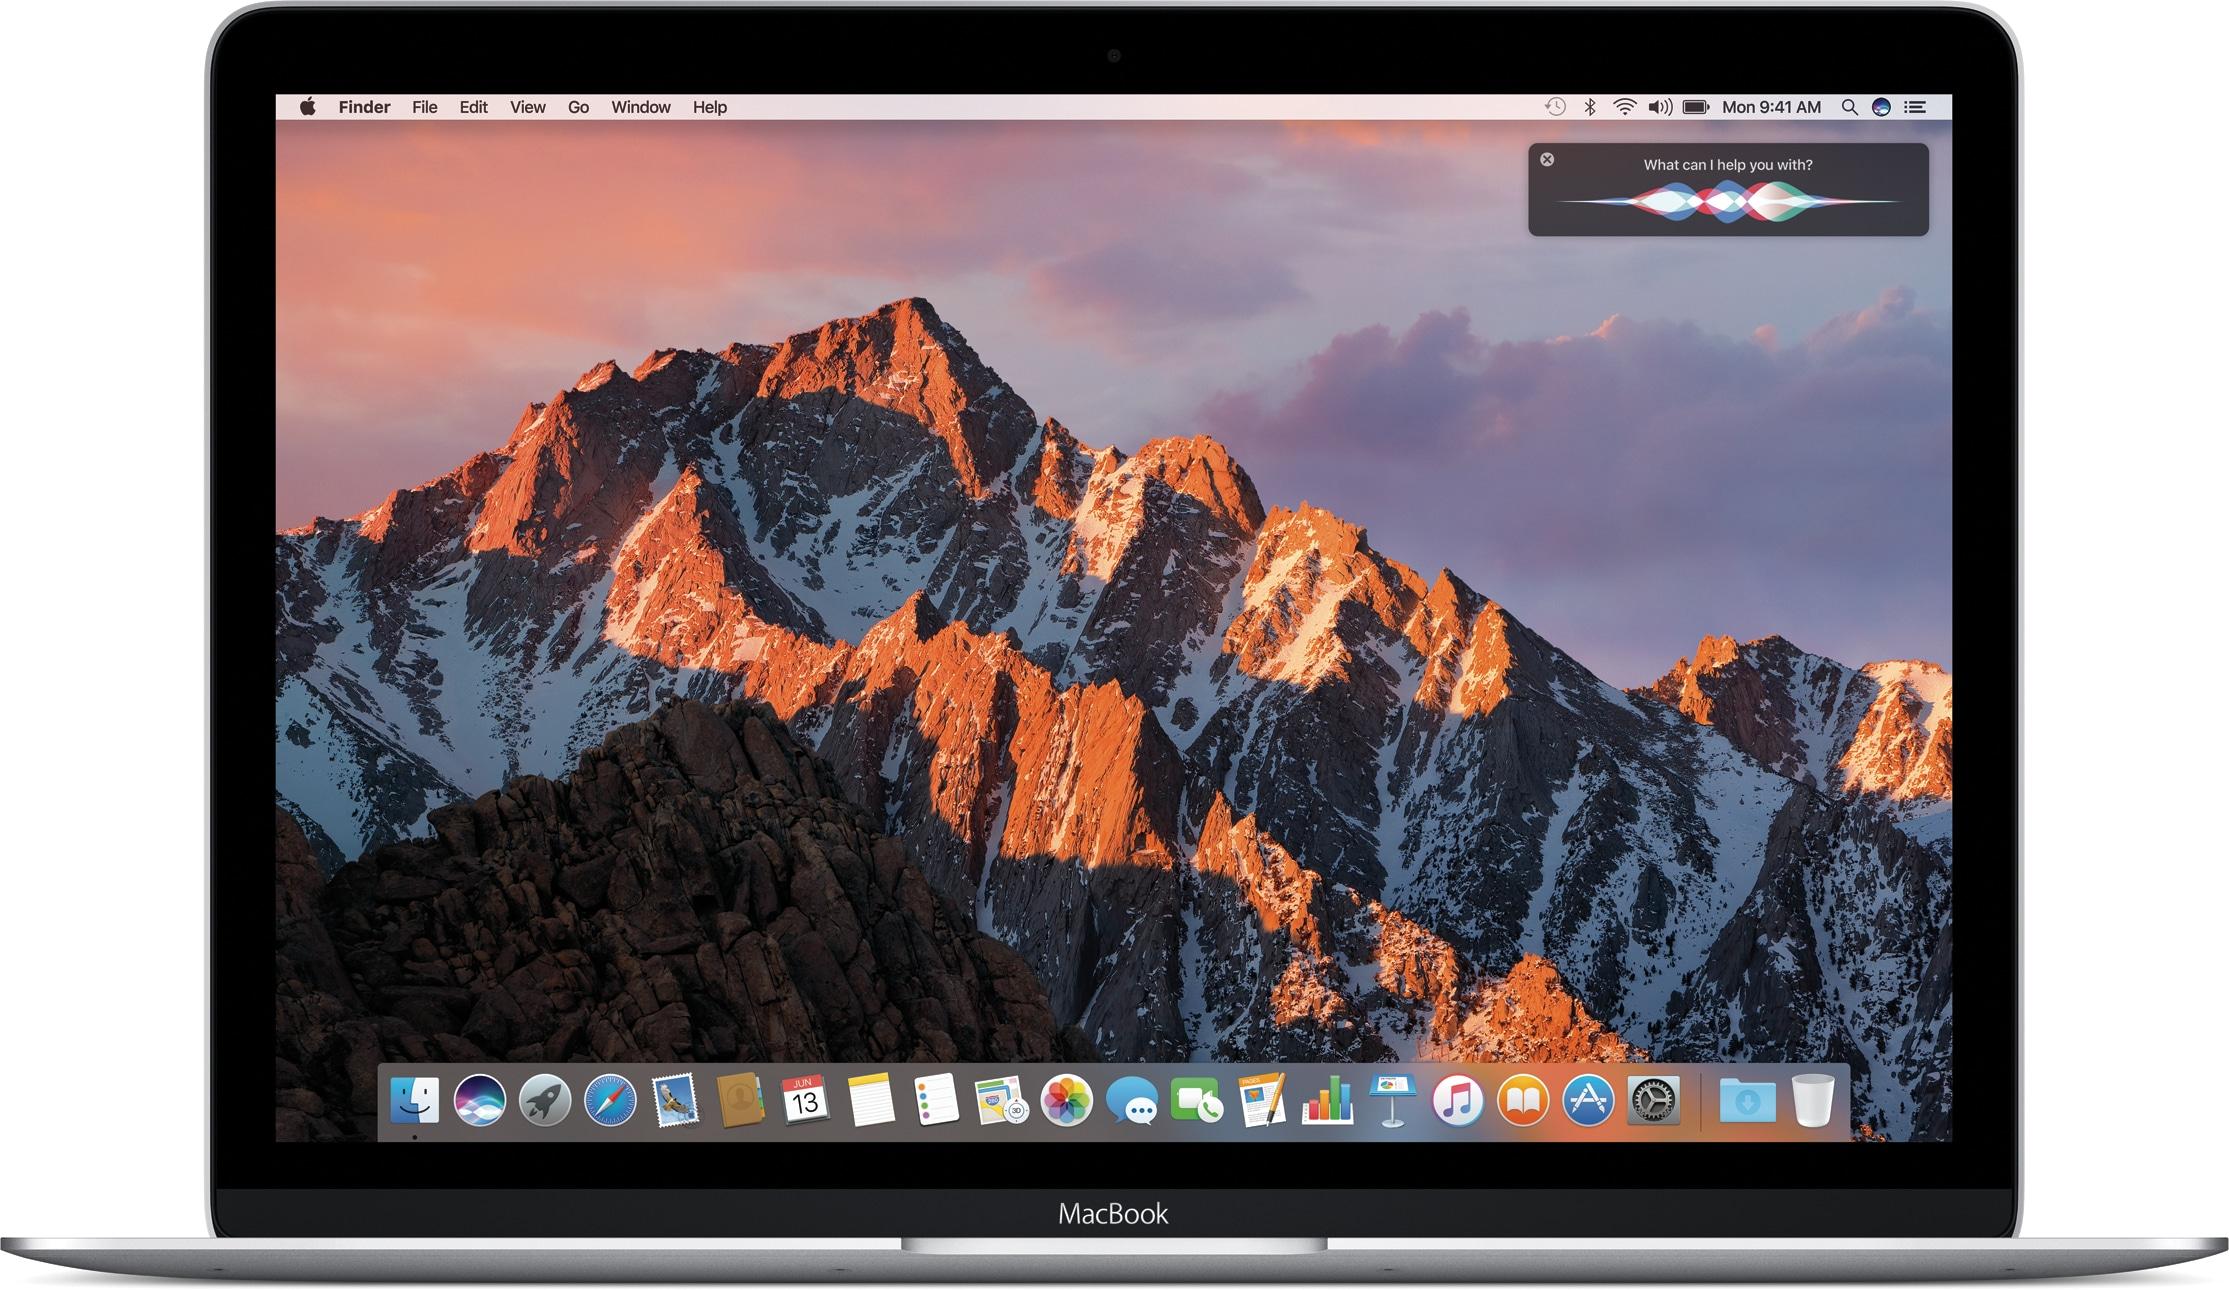 Siri rodando no macOS Sierra num MacBook